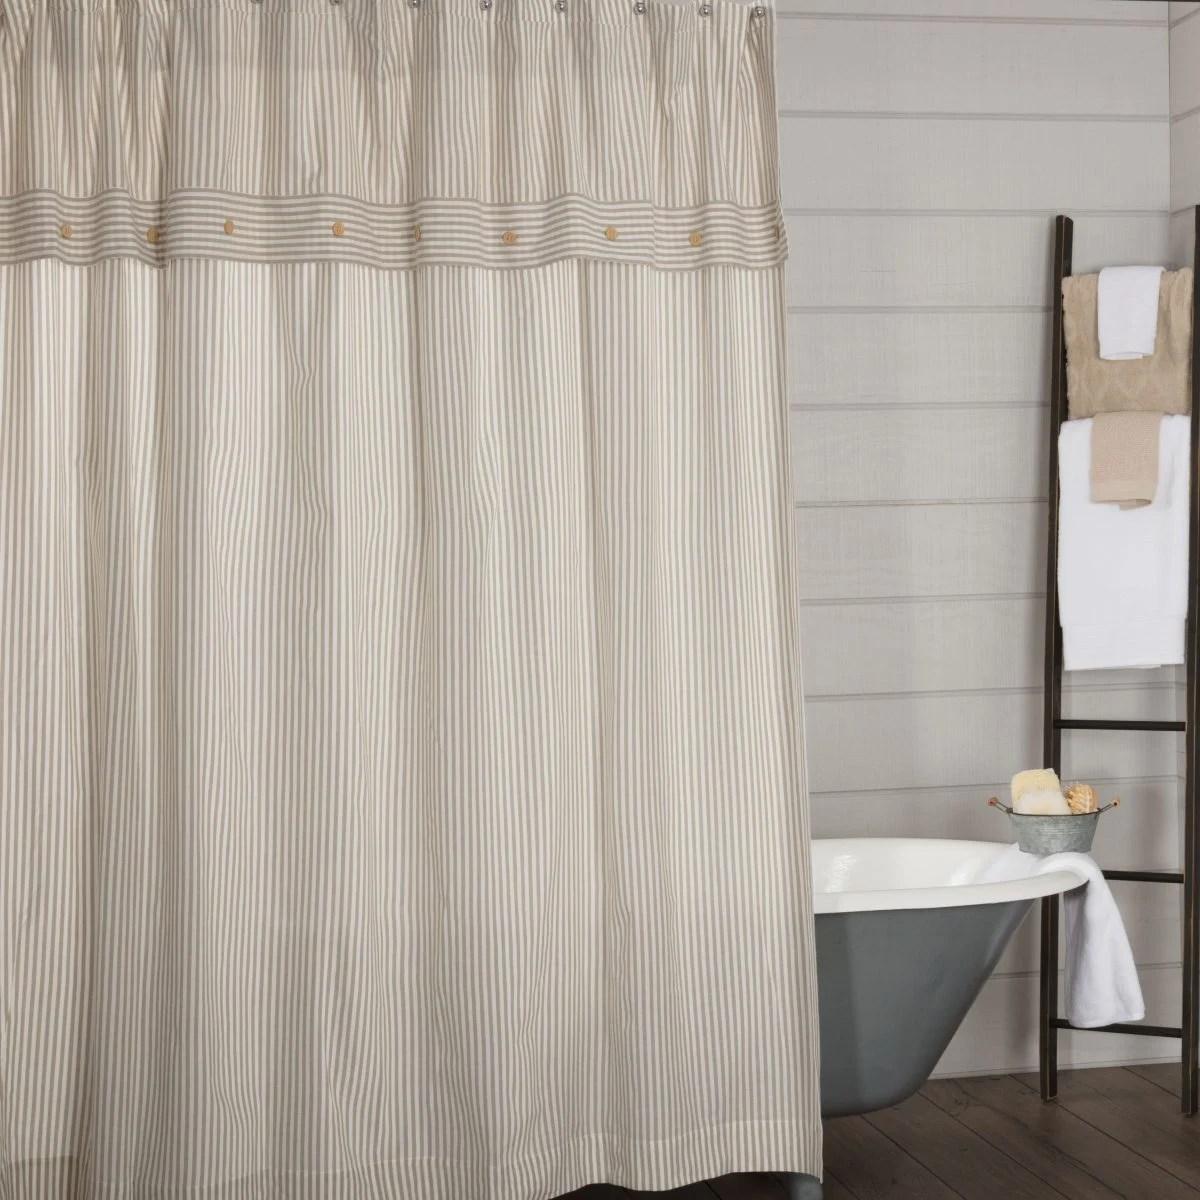 Farmhouse Ticking Taupe Shower Curtain Piper Classics